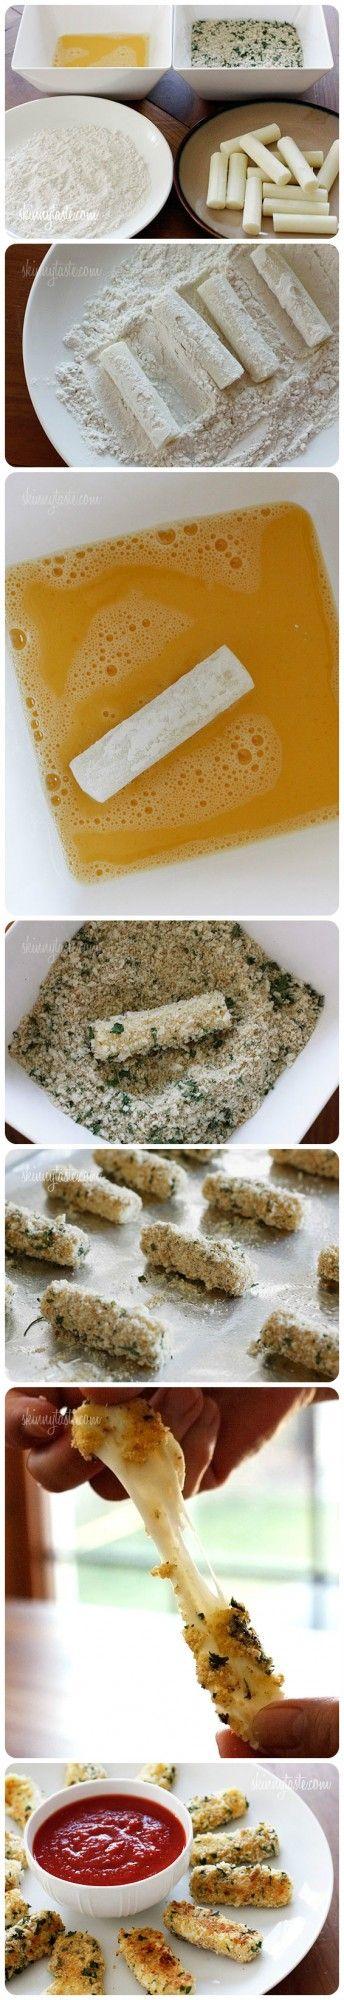 Baked Mozzarella Sticks Recipe: